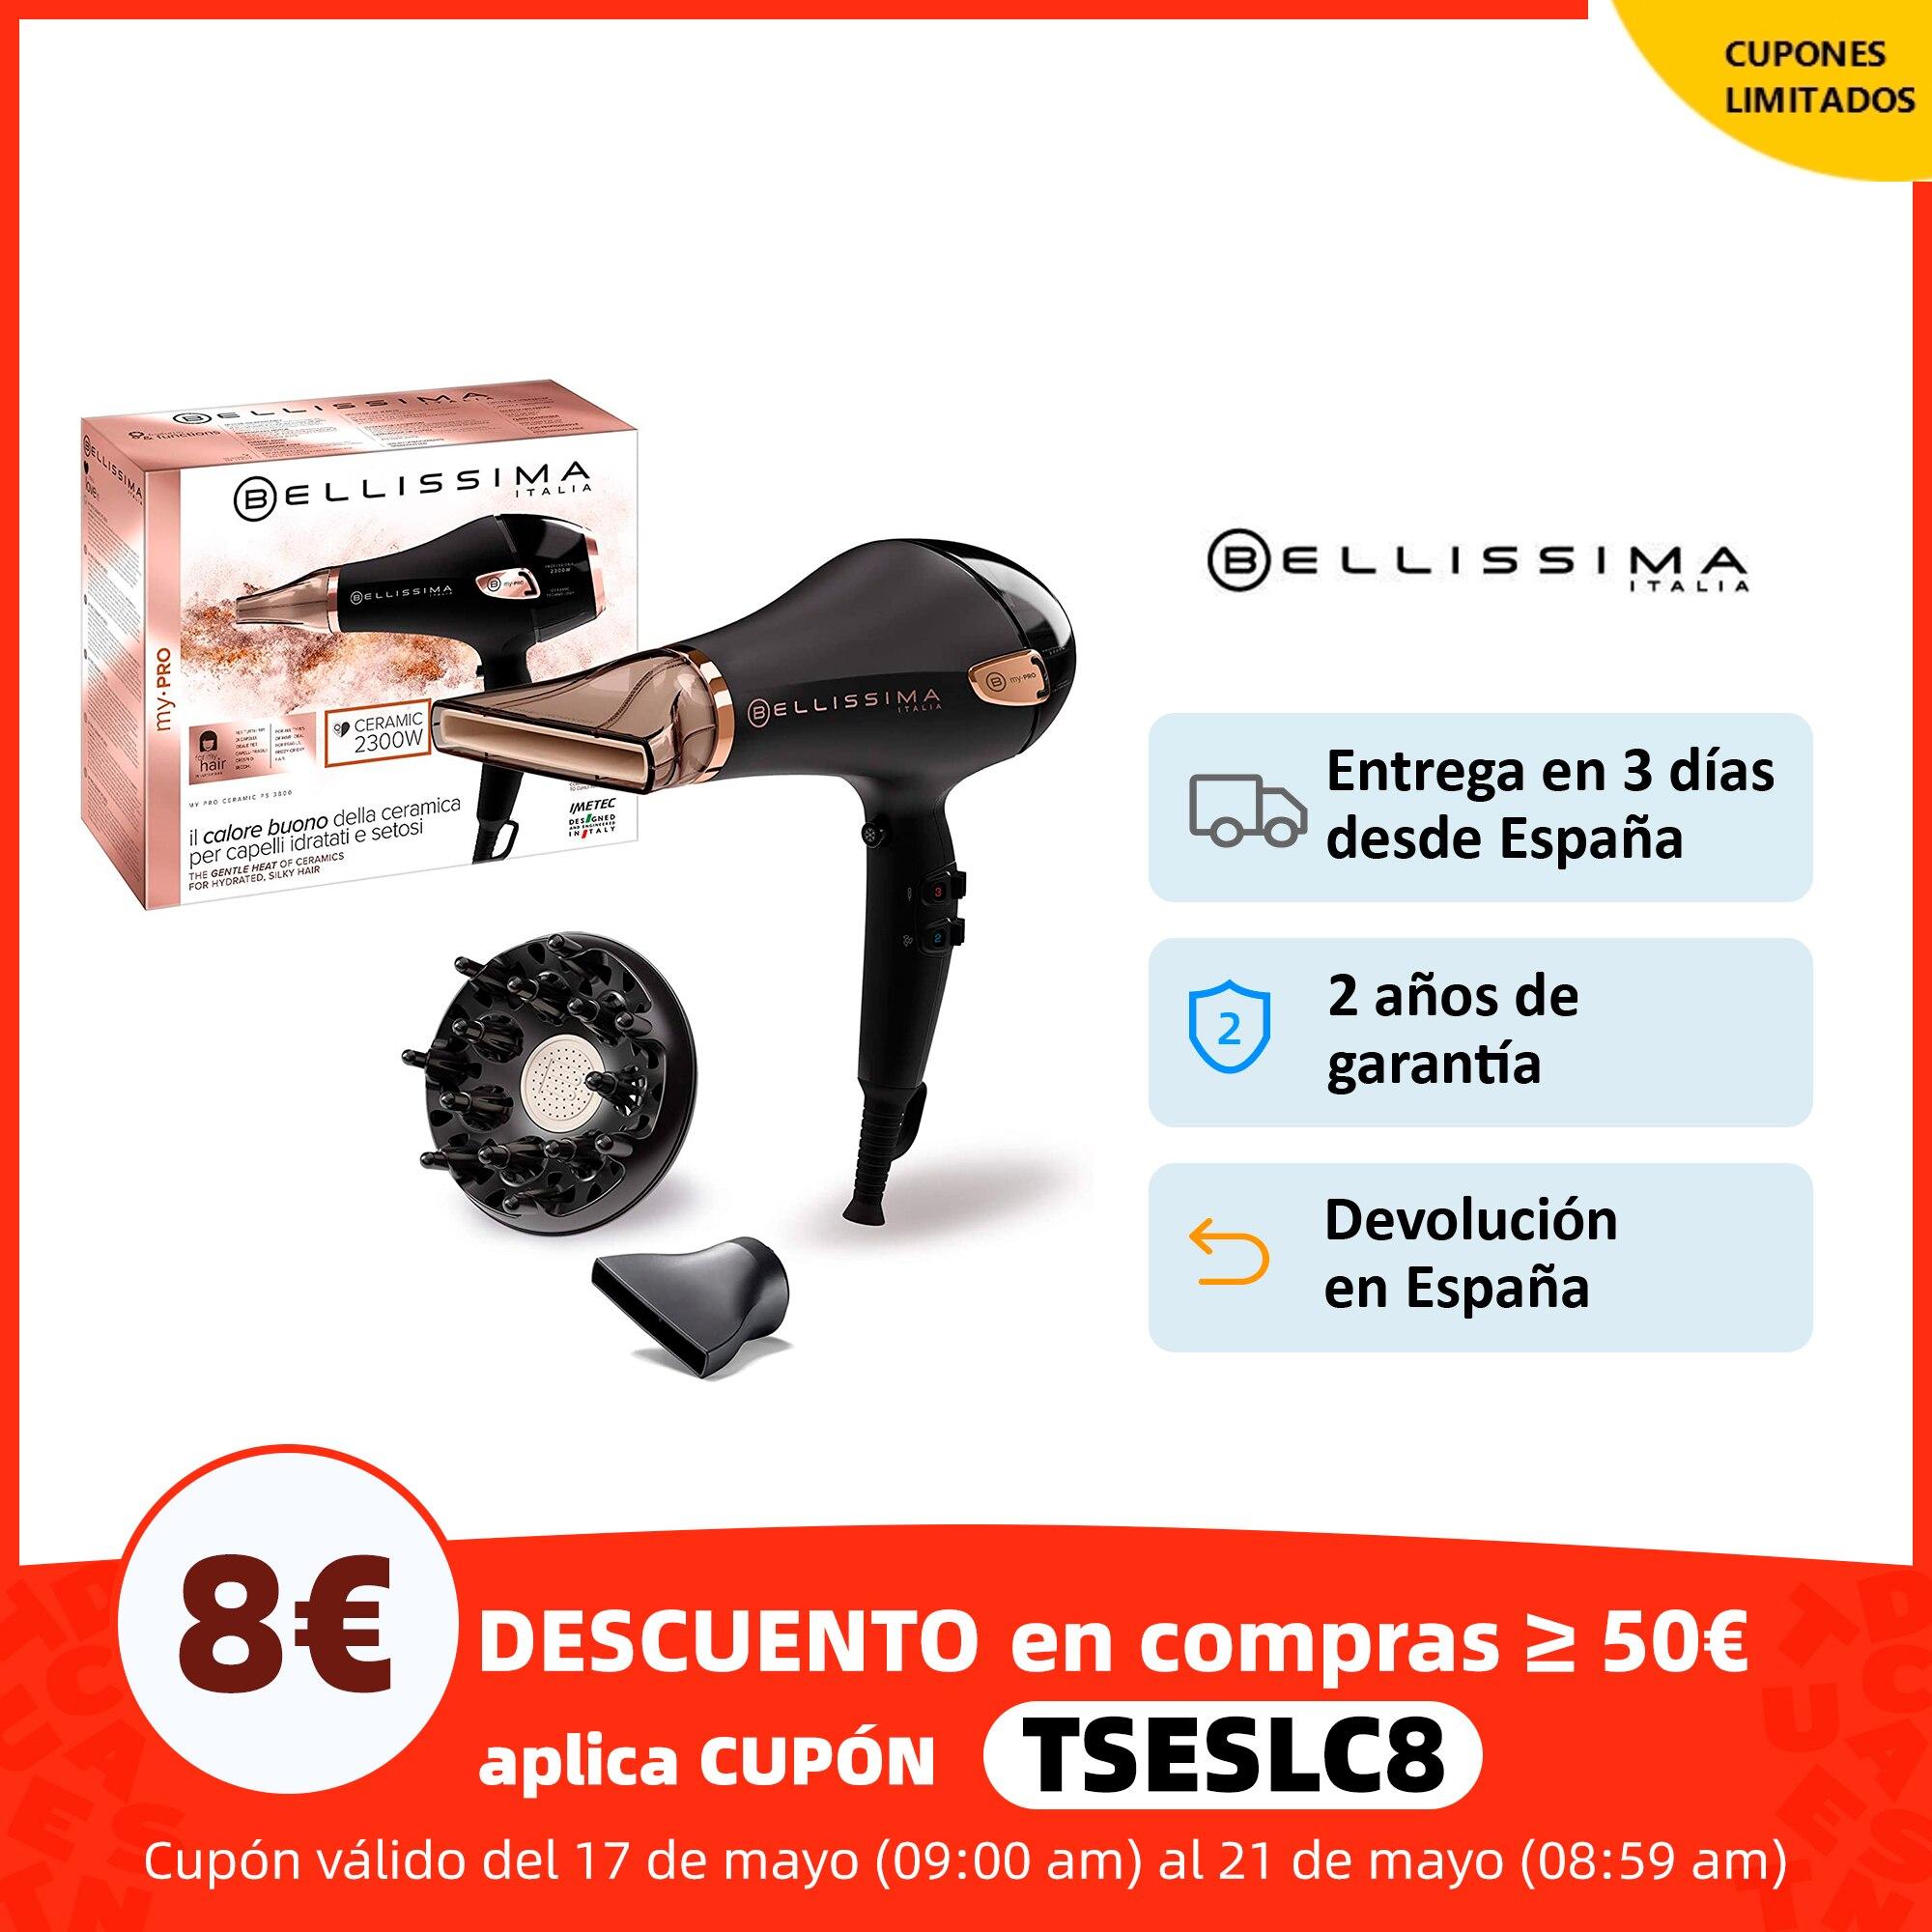 Bellissima Secador de Pelo My Pro Ceramic P5 3800 para unos Rizos Naturales | Secador de Cabello | Secadores profesionales| | - AliExpress